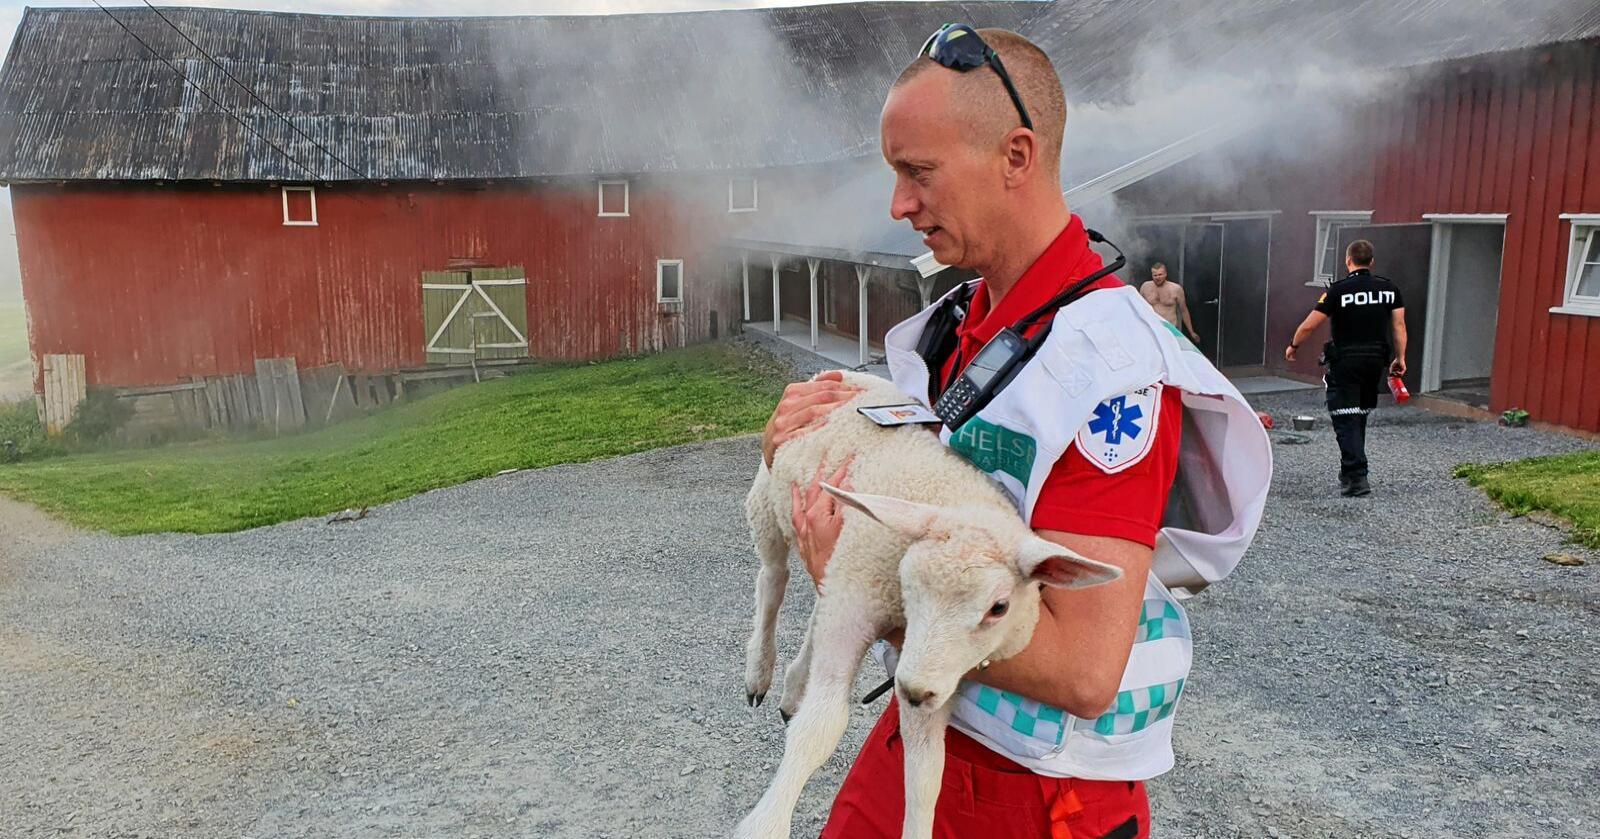 Ambulansearbeider Even Nordli redder et lam fra gården i Snertingdalen. Foto: Politiet